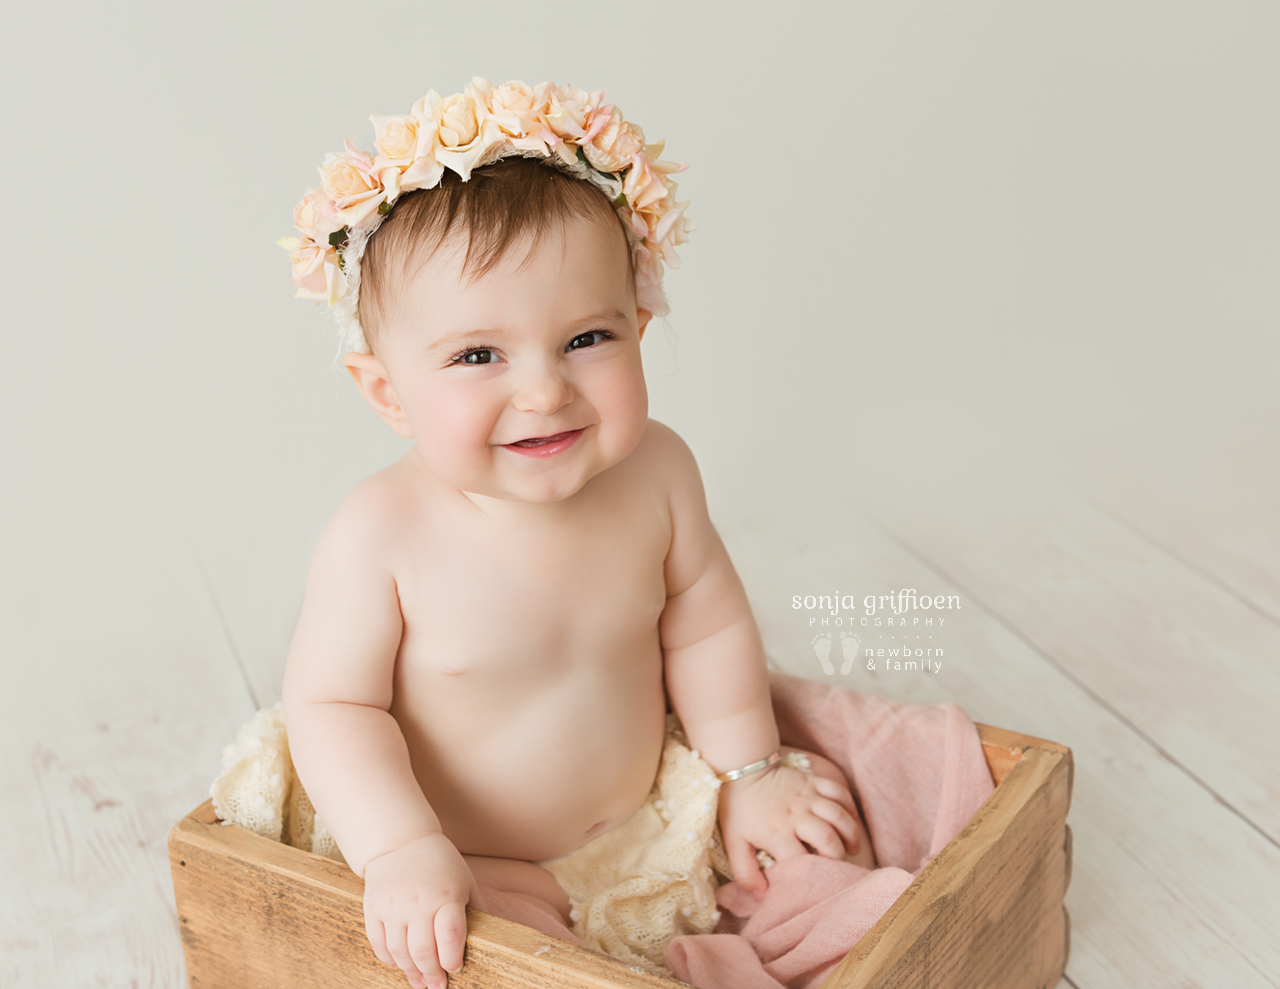 Annabella-Milestone-Brisbane-Baby-Photographer-Sonja-Griffioen-09.jpg